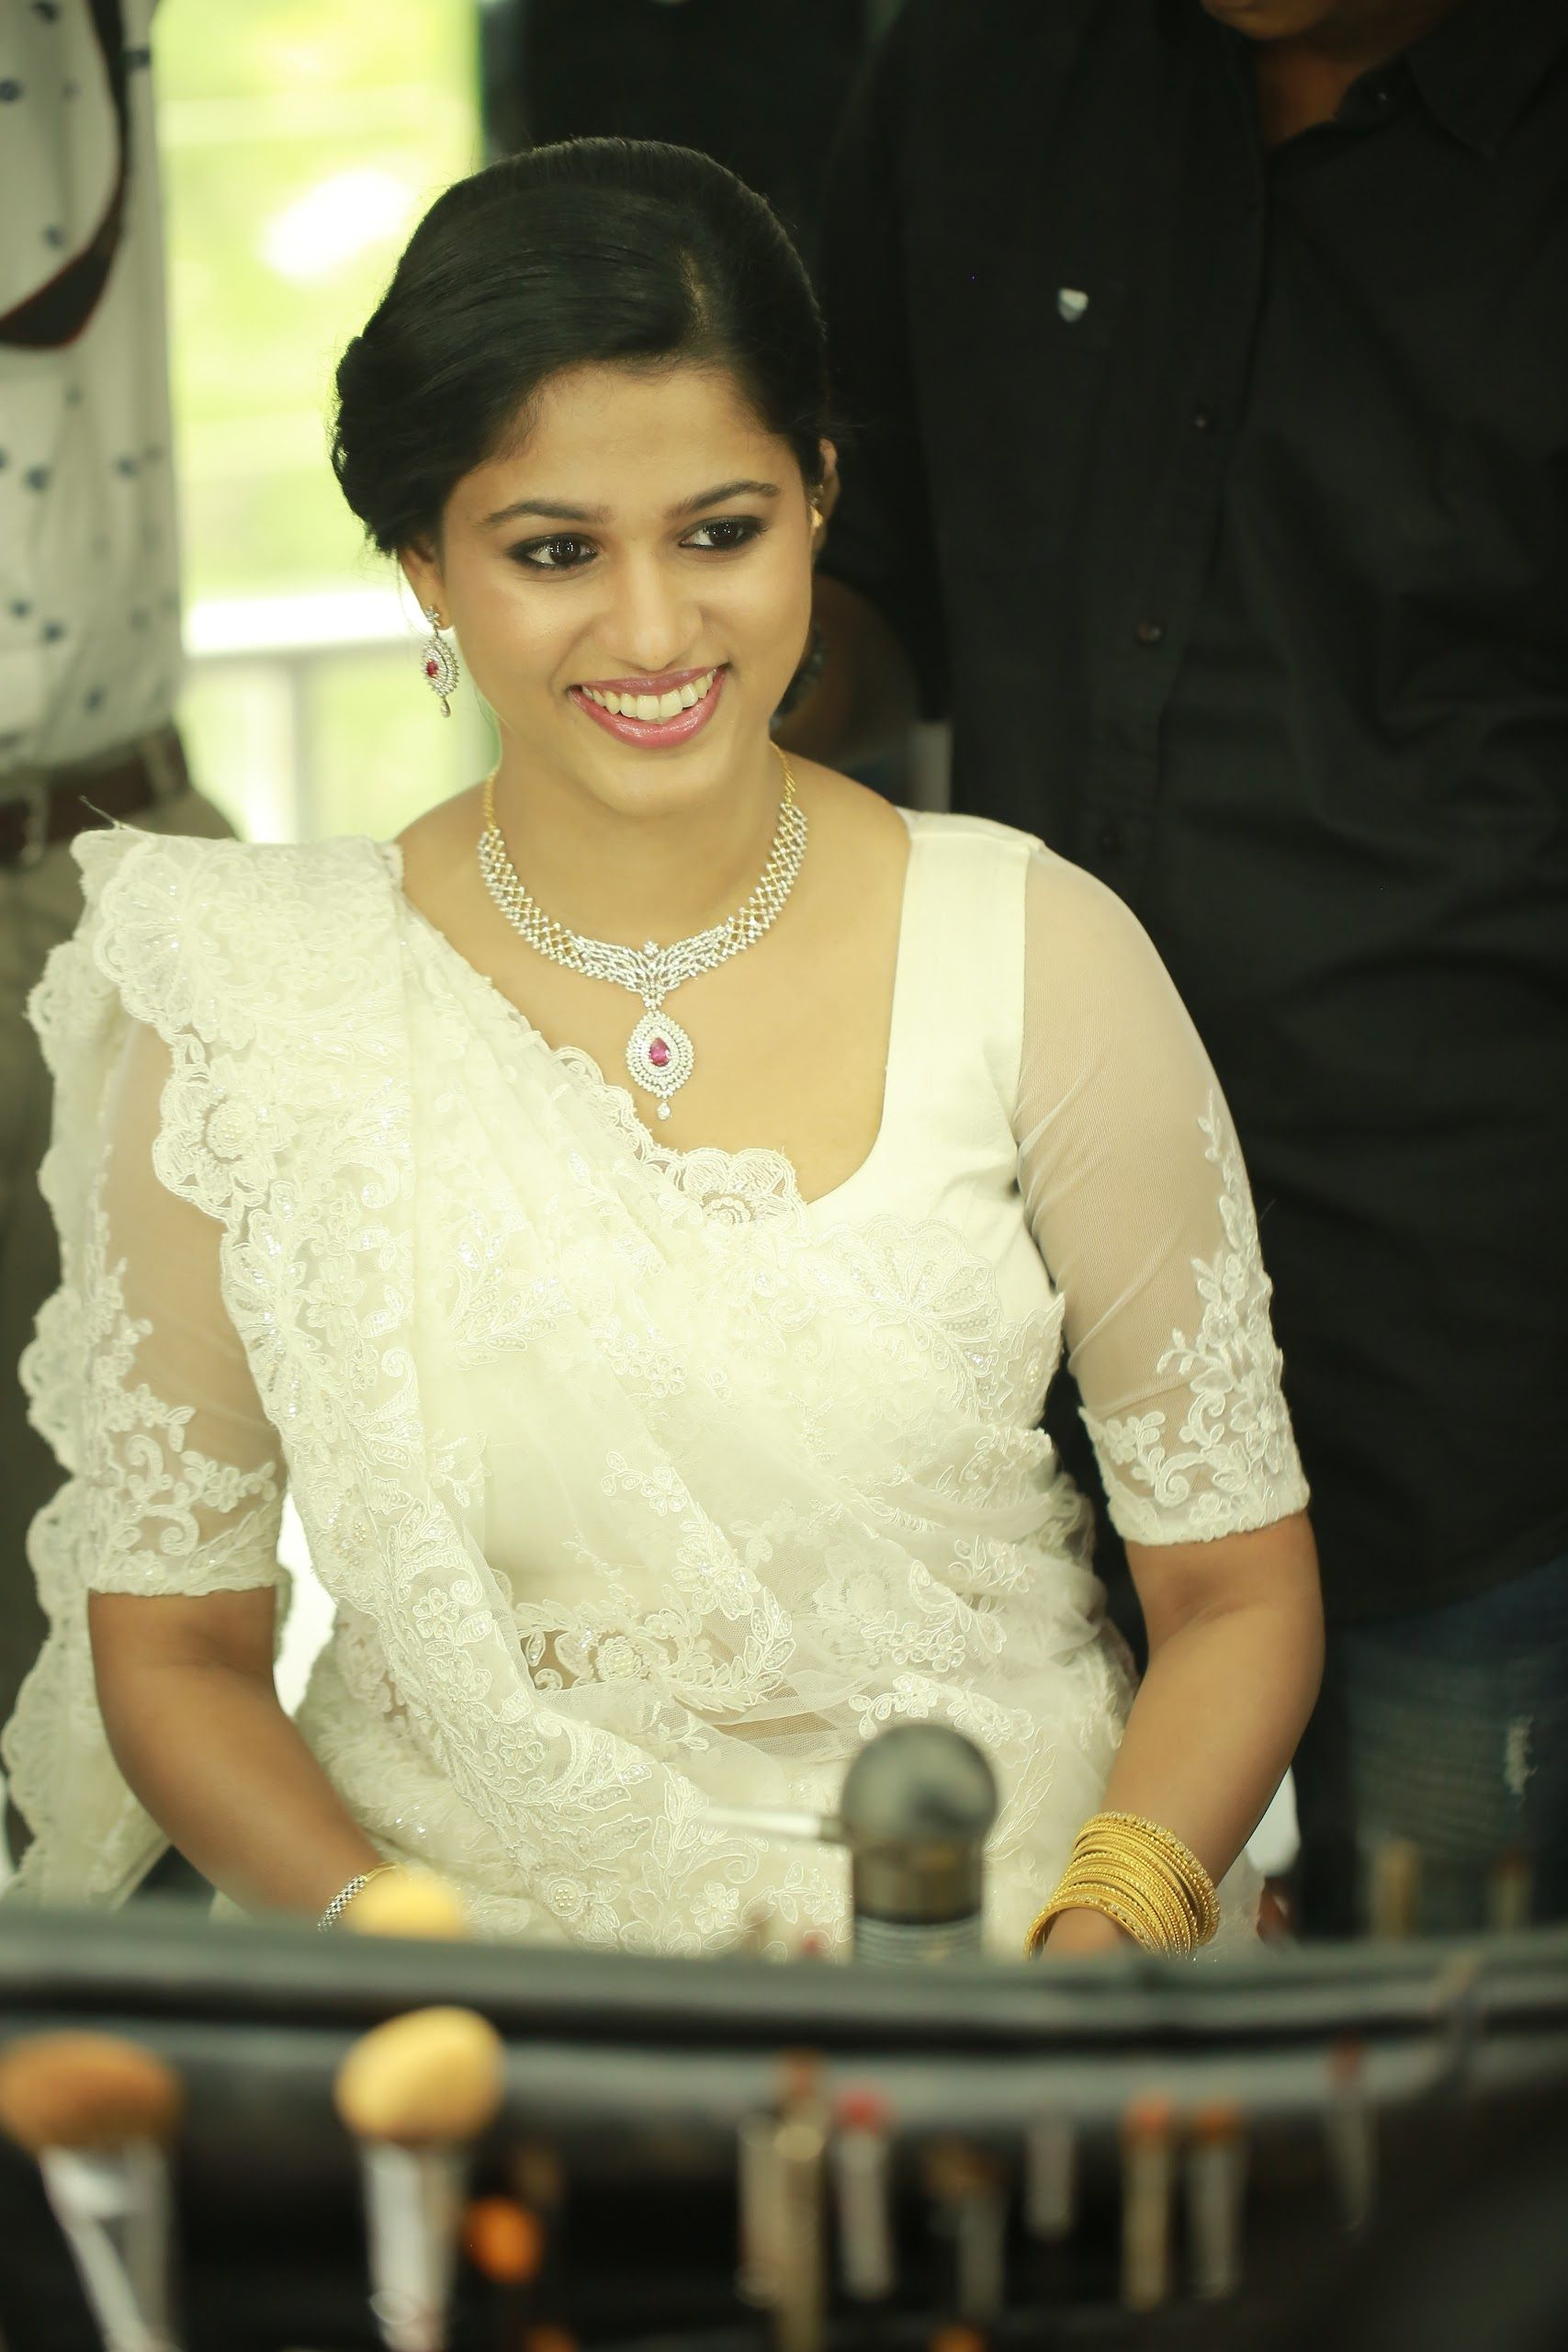 Christian Wedding White Saree Althea Bridals And Bespoke